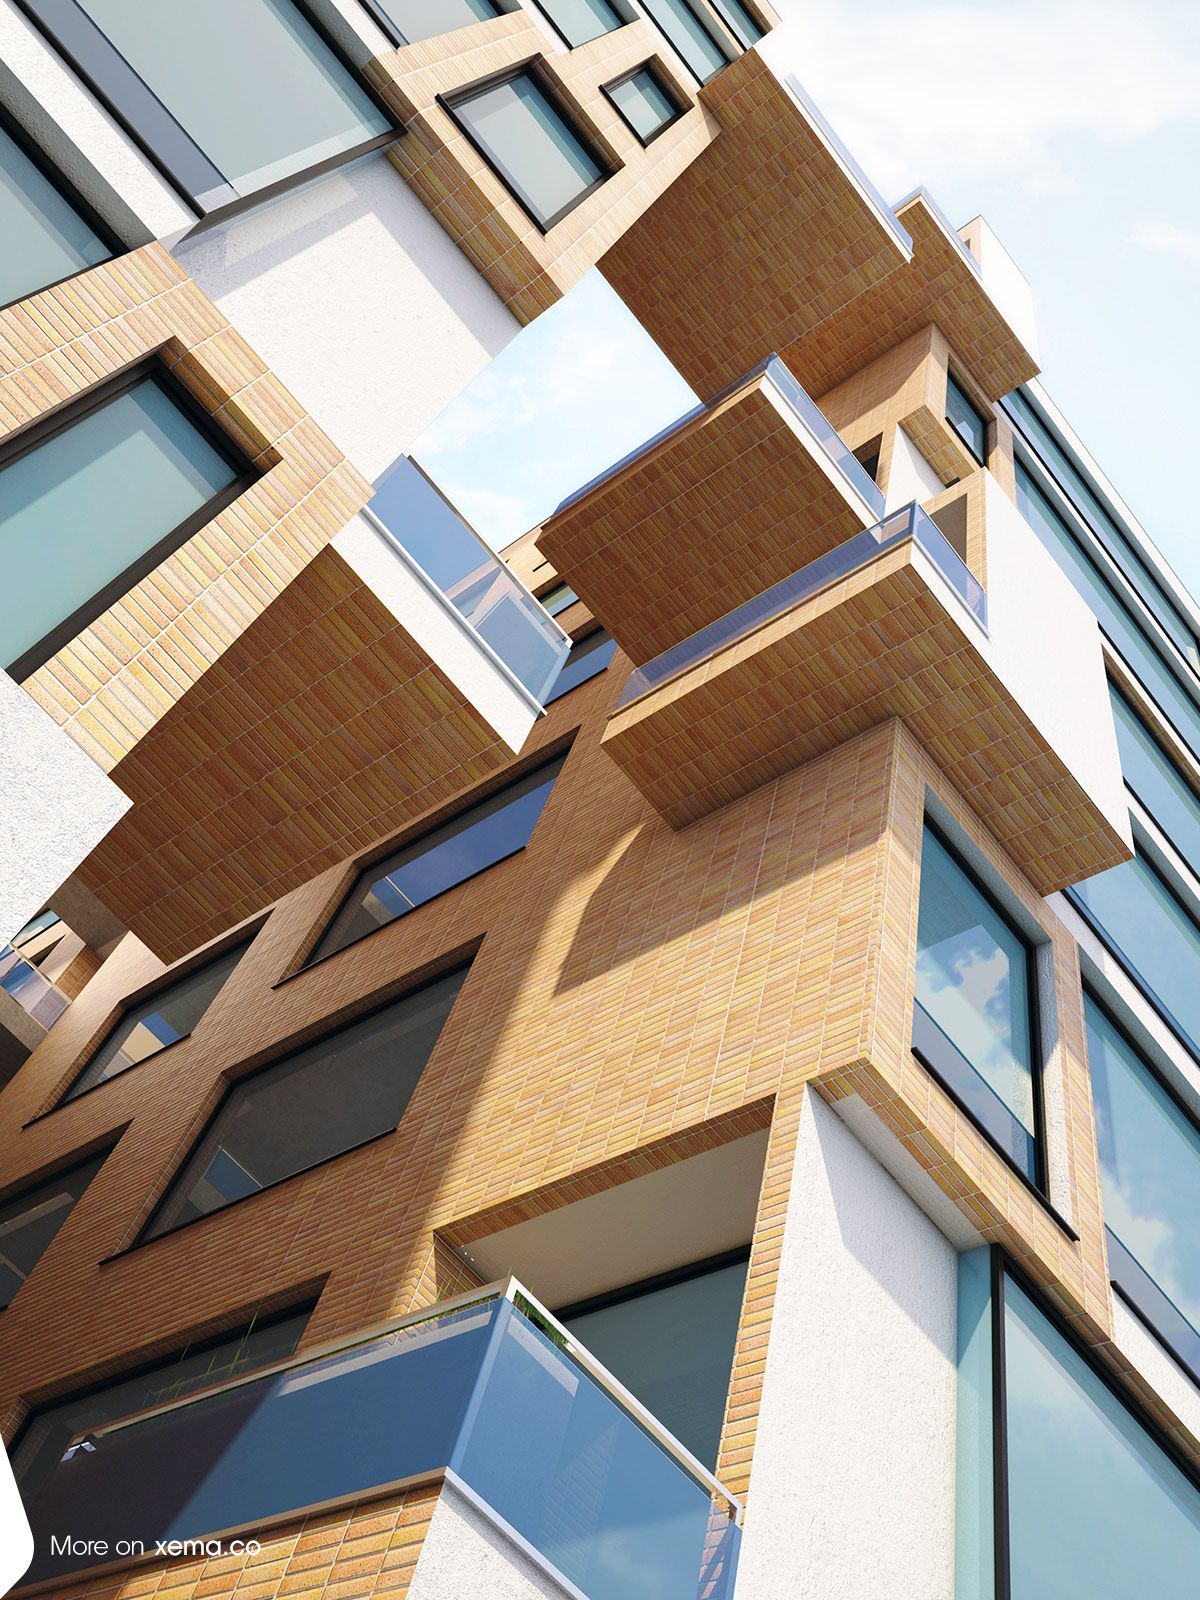 Sepah Bank Residential Complex | Tehran, Iran | 2013 | 21000 m2  | Designer: Reza Mafakher  | Full info : http://www.xema.co/projects/detail/67 |  #sepah_bank_residentioal_complex #architecture #xema #minimal #avantgarde #rezamafakher #xema_the_evolutionizer